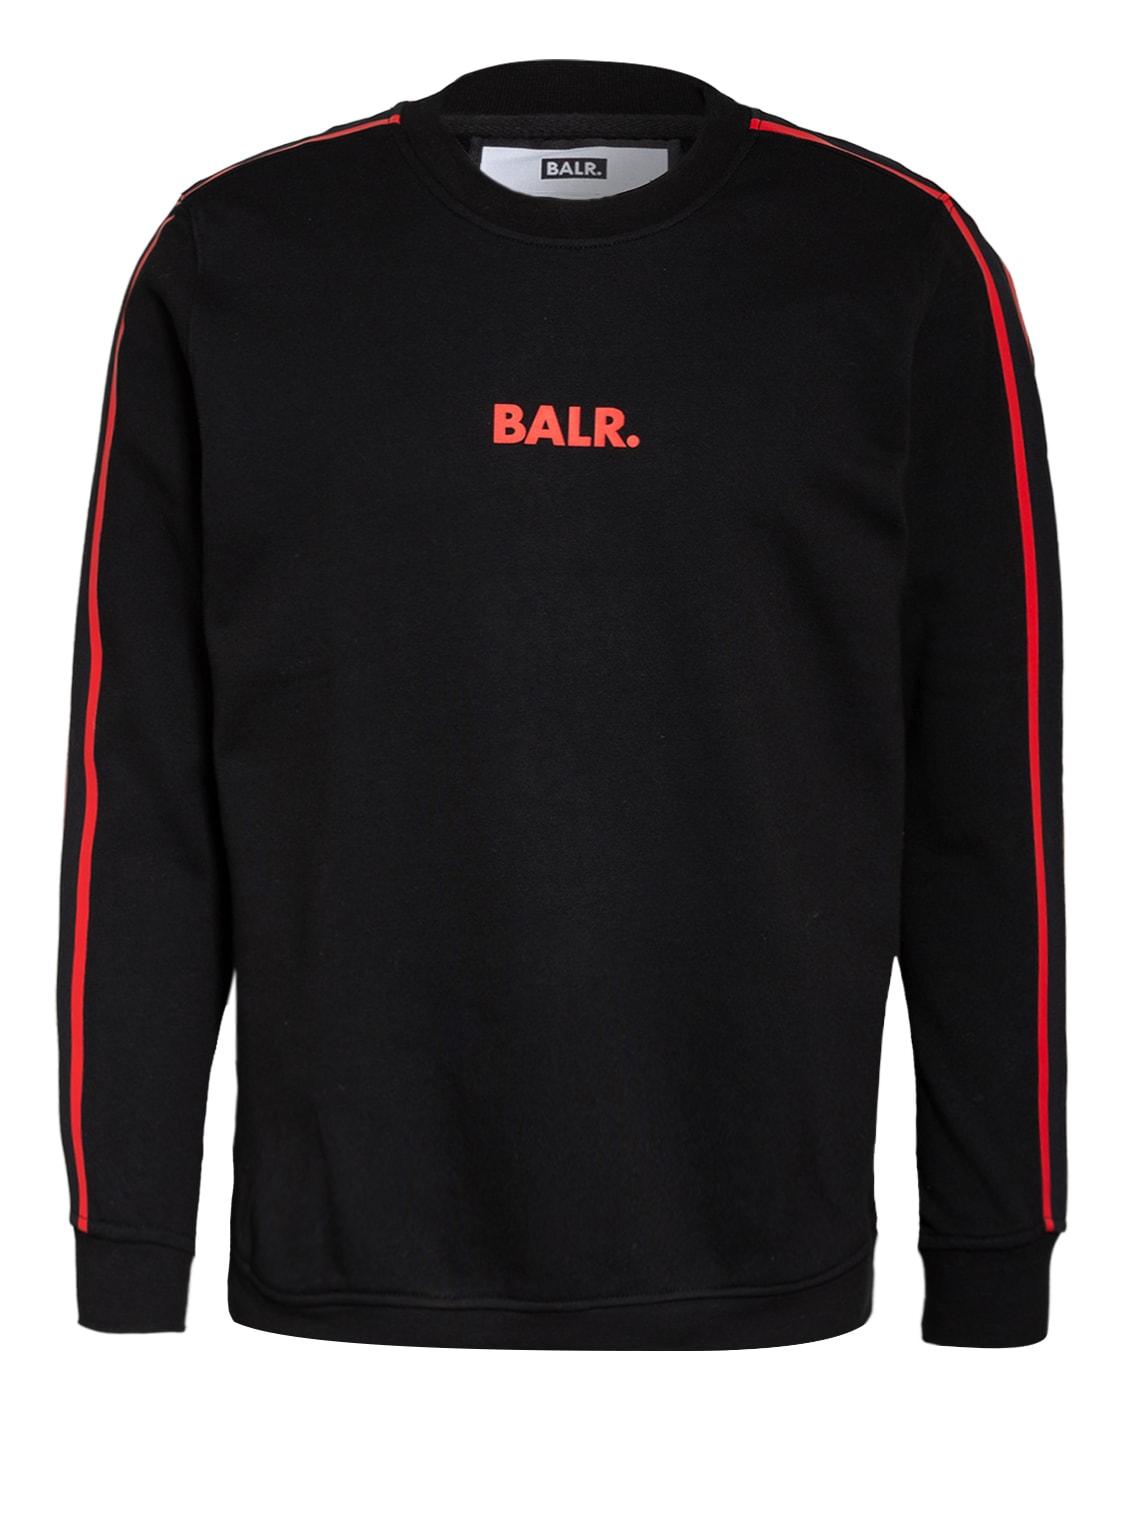 Image of Balr. Sweatshirt schwarz